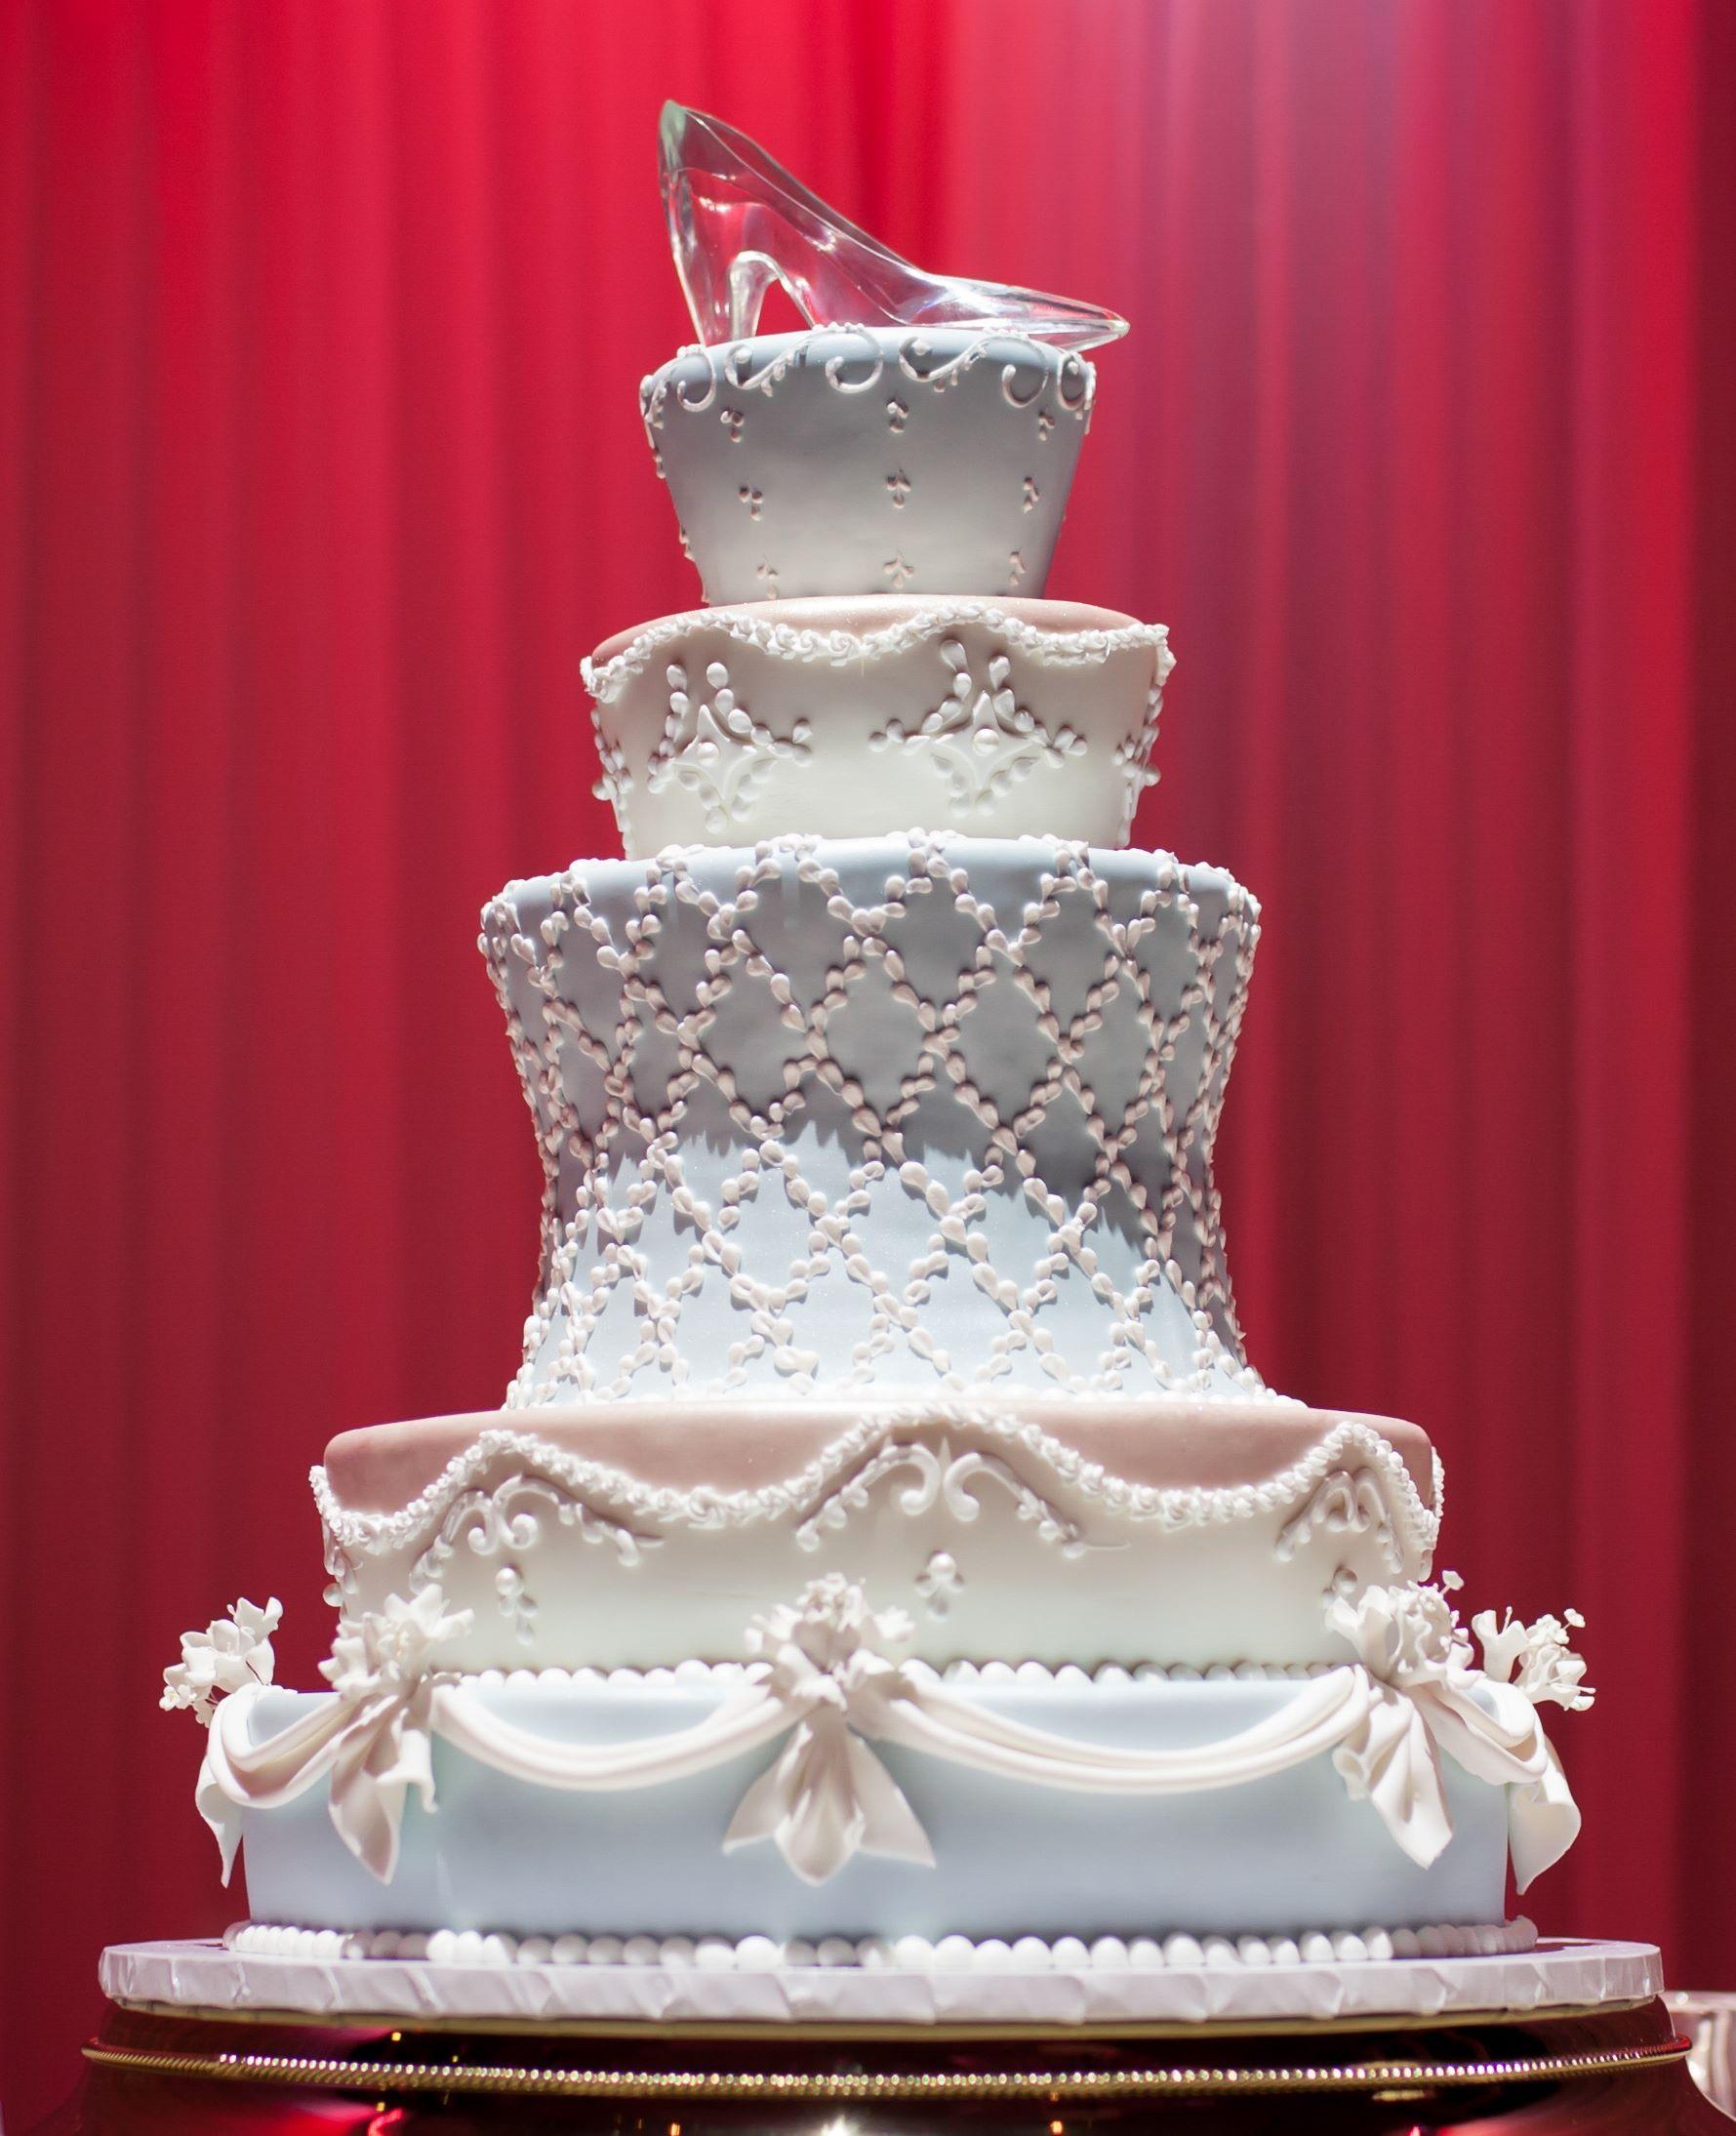 Cinderella Wedding Cake Wedding Cakes Pinterest Wedding cake